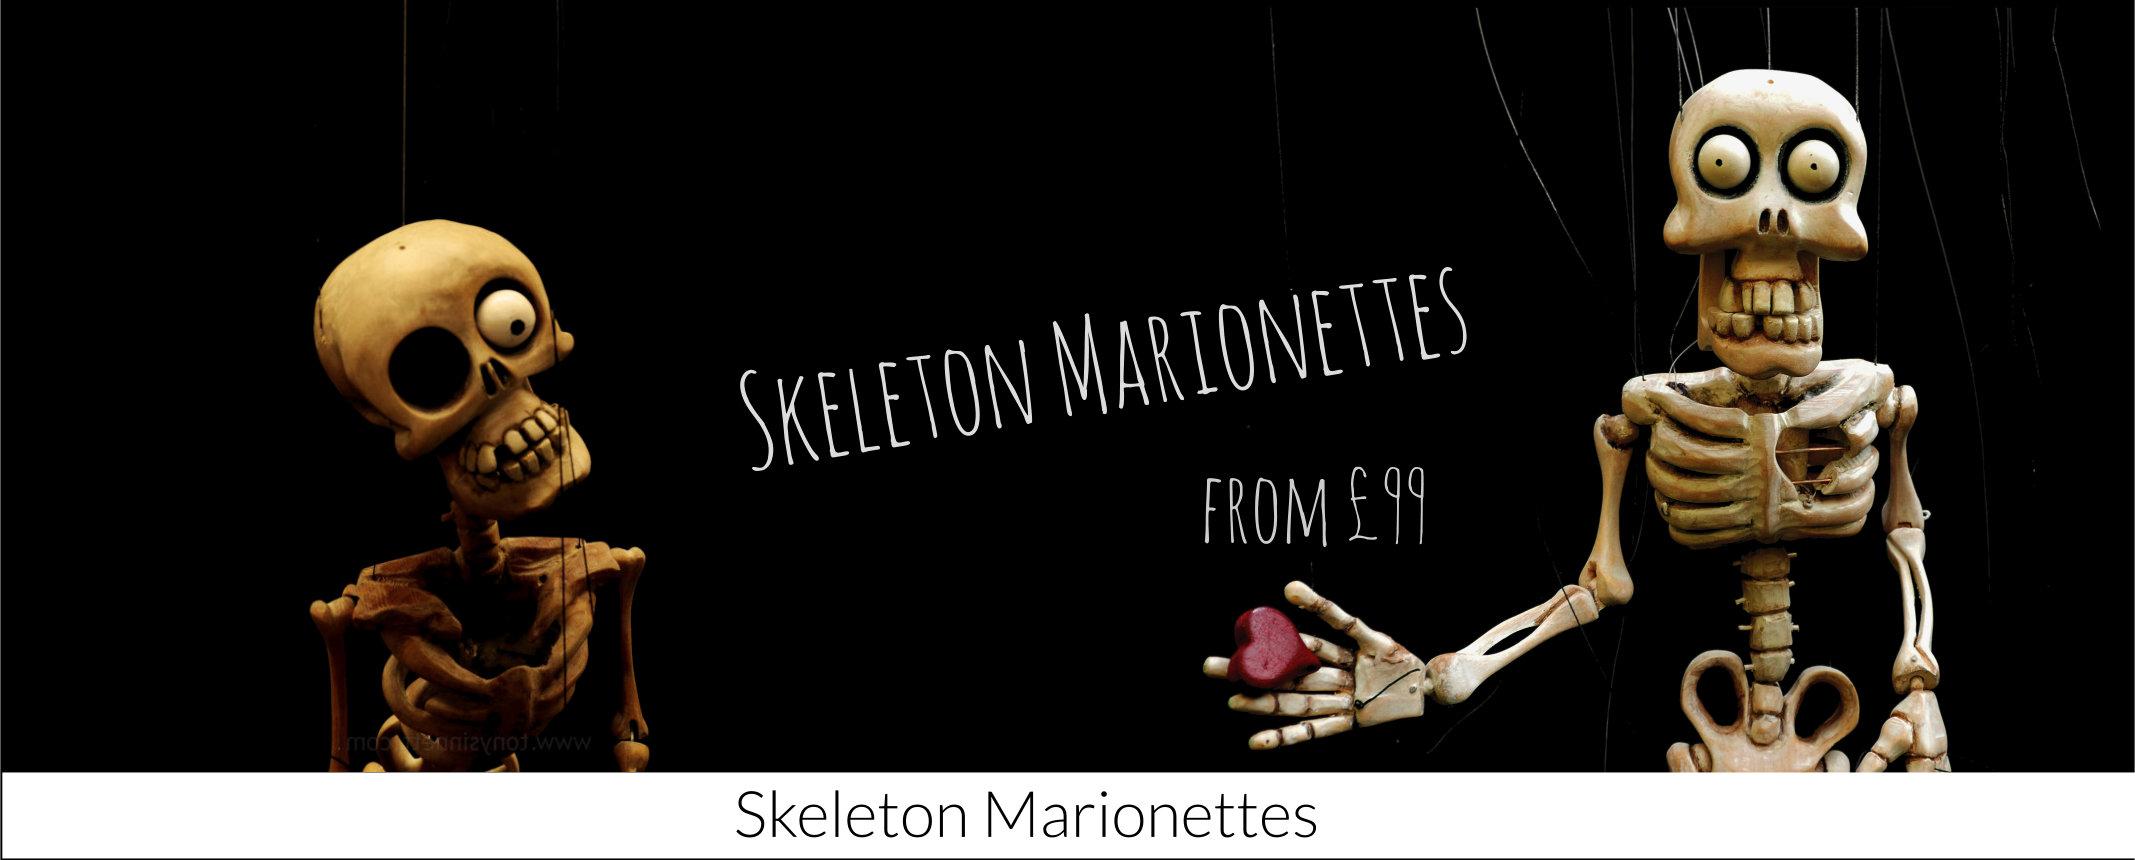 Skeleton Marionettes